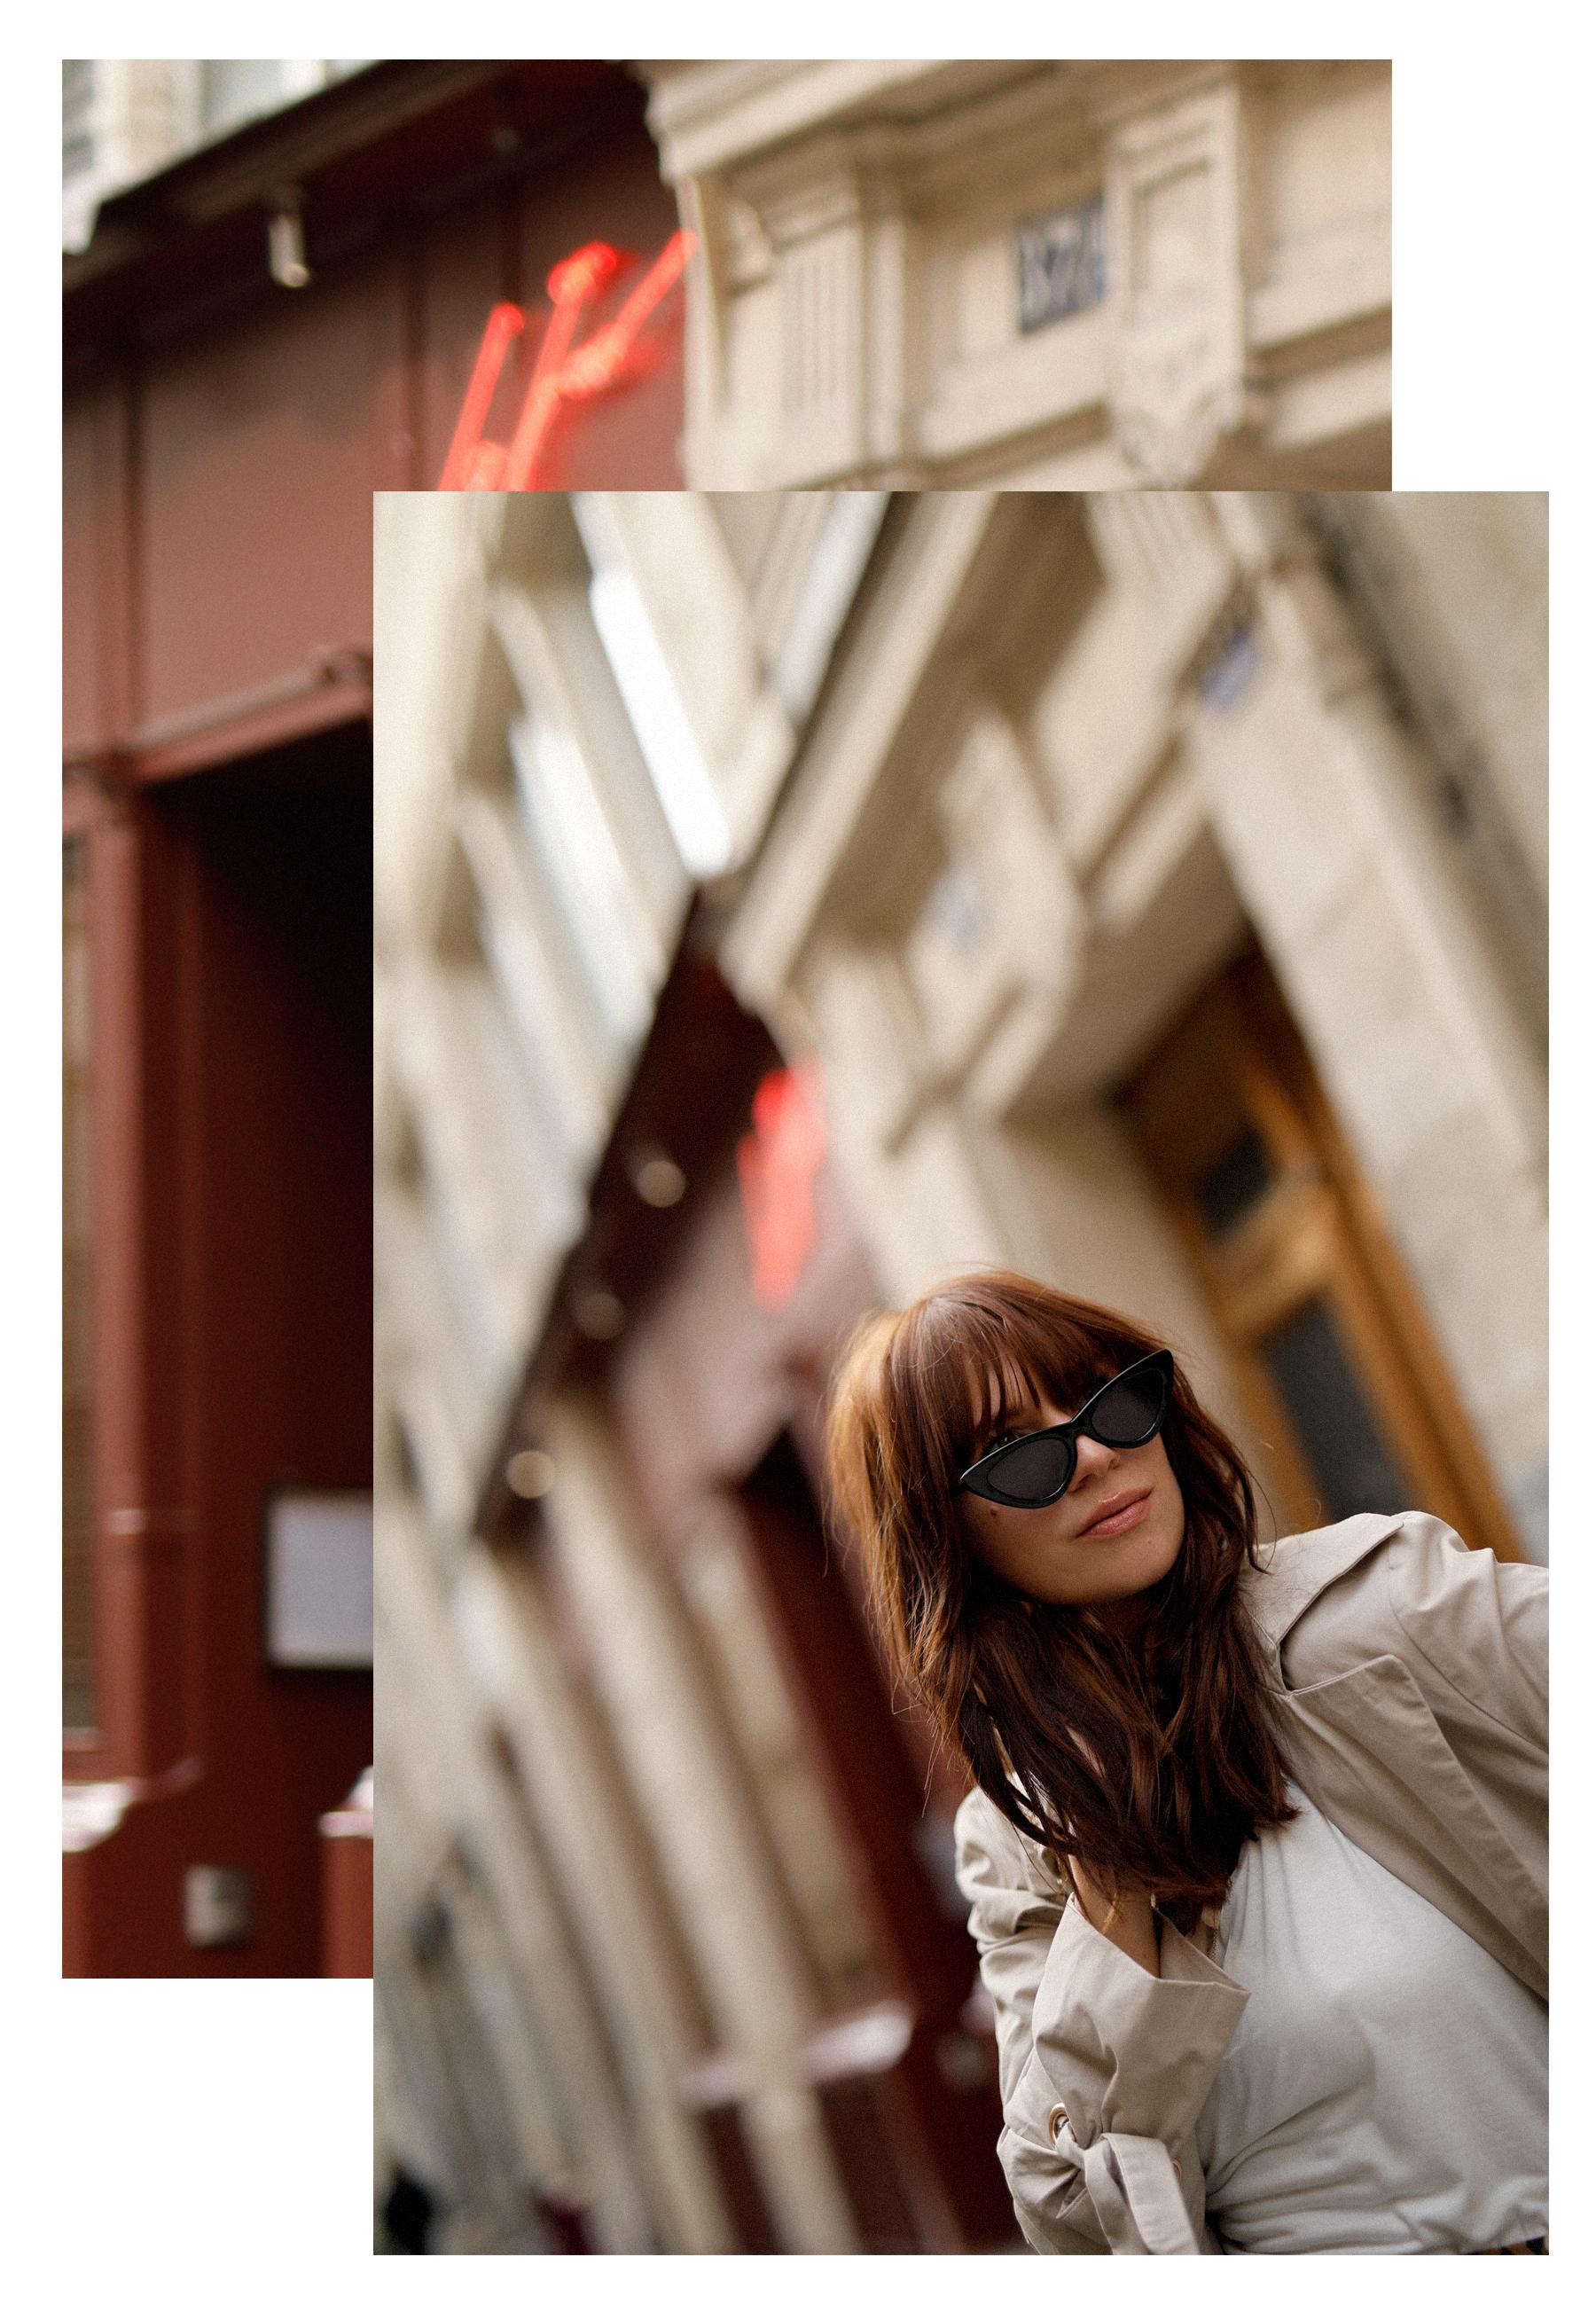 paris love mon amour mint&berry leopard print skirt trench coat valentino rockstud breuninger catsanddogsblog modeblogger styleblog modeblog outfitblog parisienne styliste cats&dogs max bechmann fotografie film düsseldorf 3